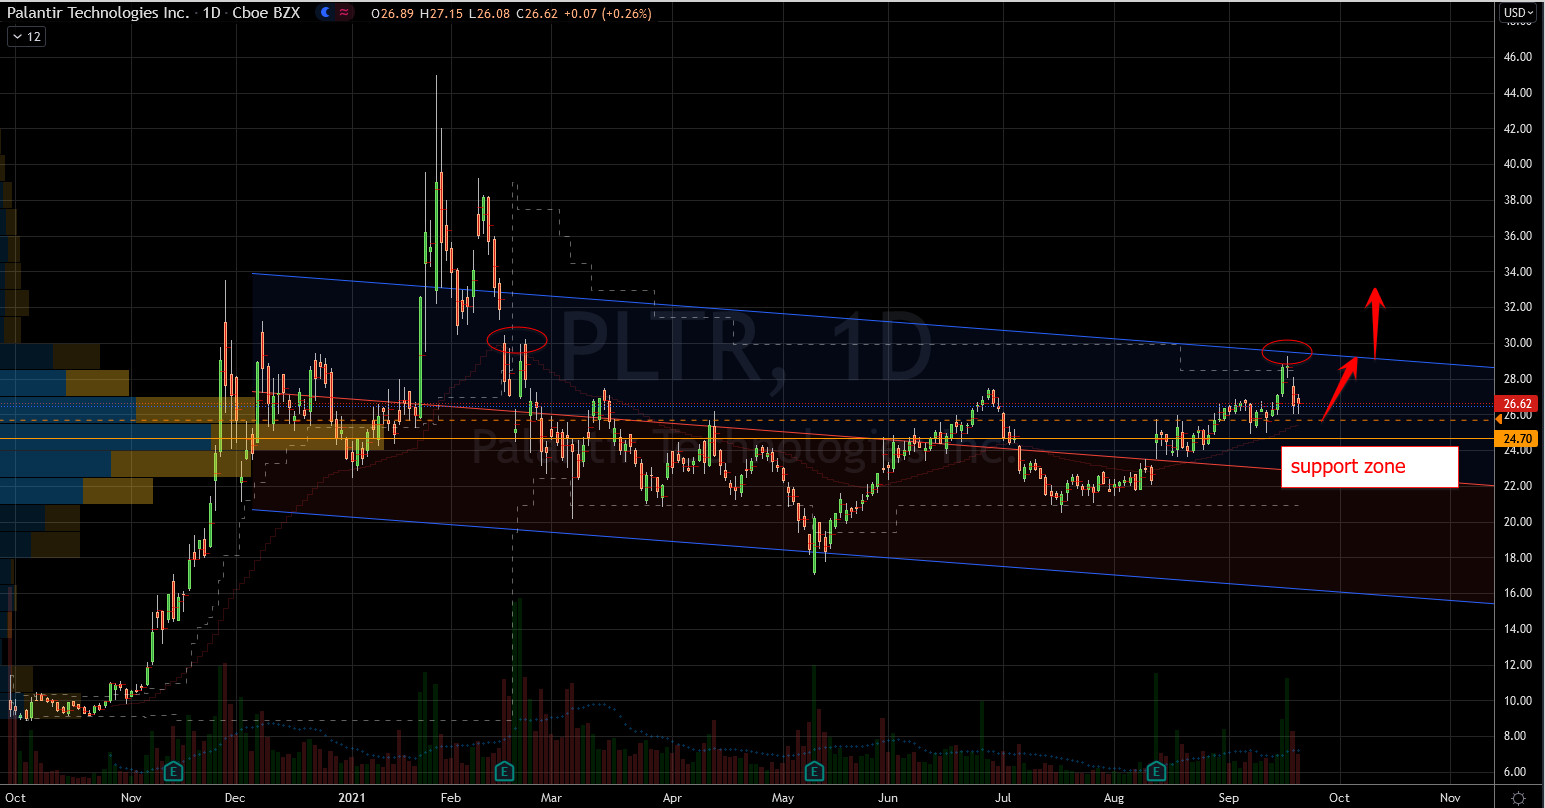 Palantir (PLTR) Stock Chart Showing Bullish Path